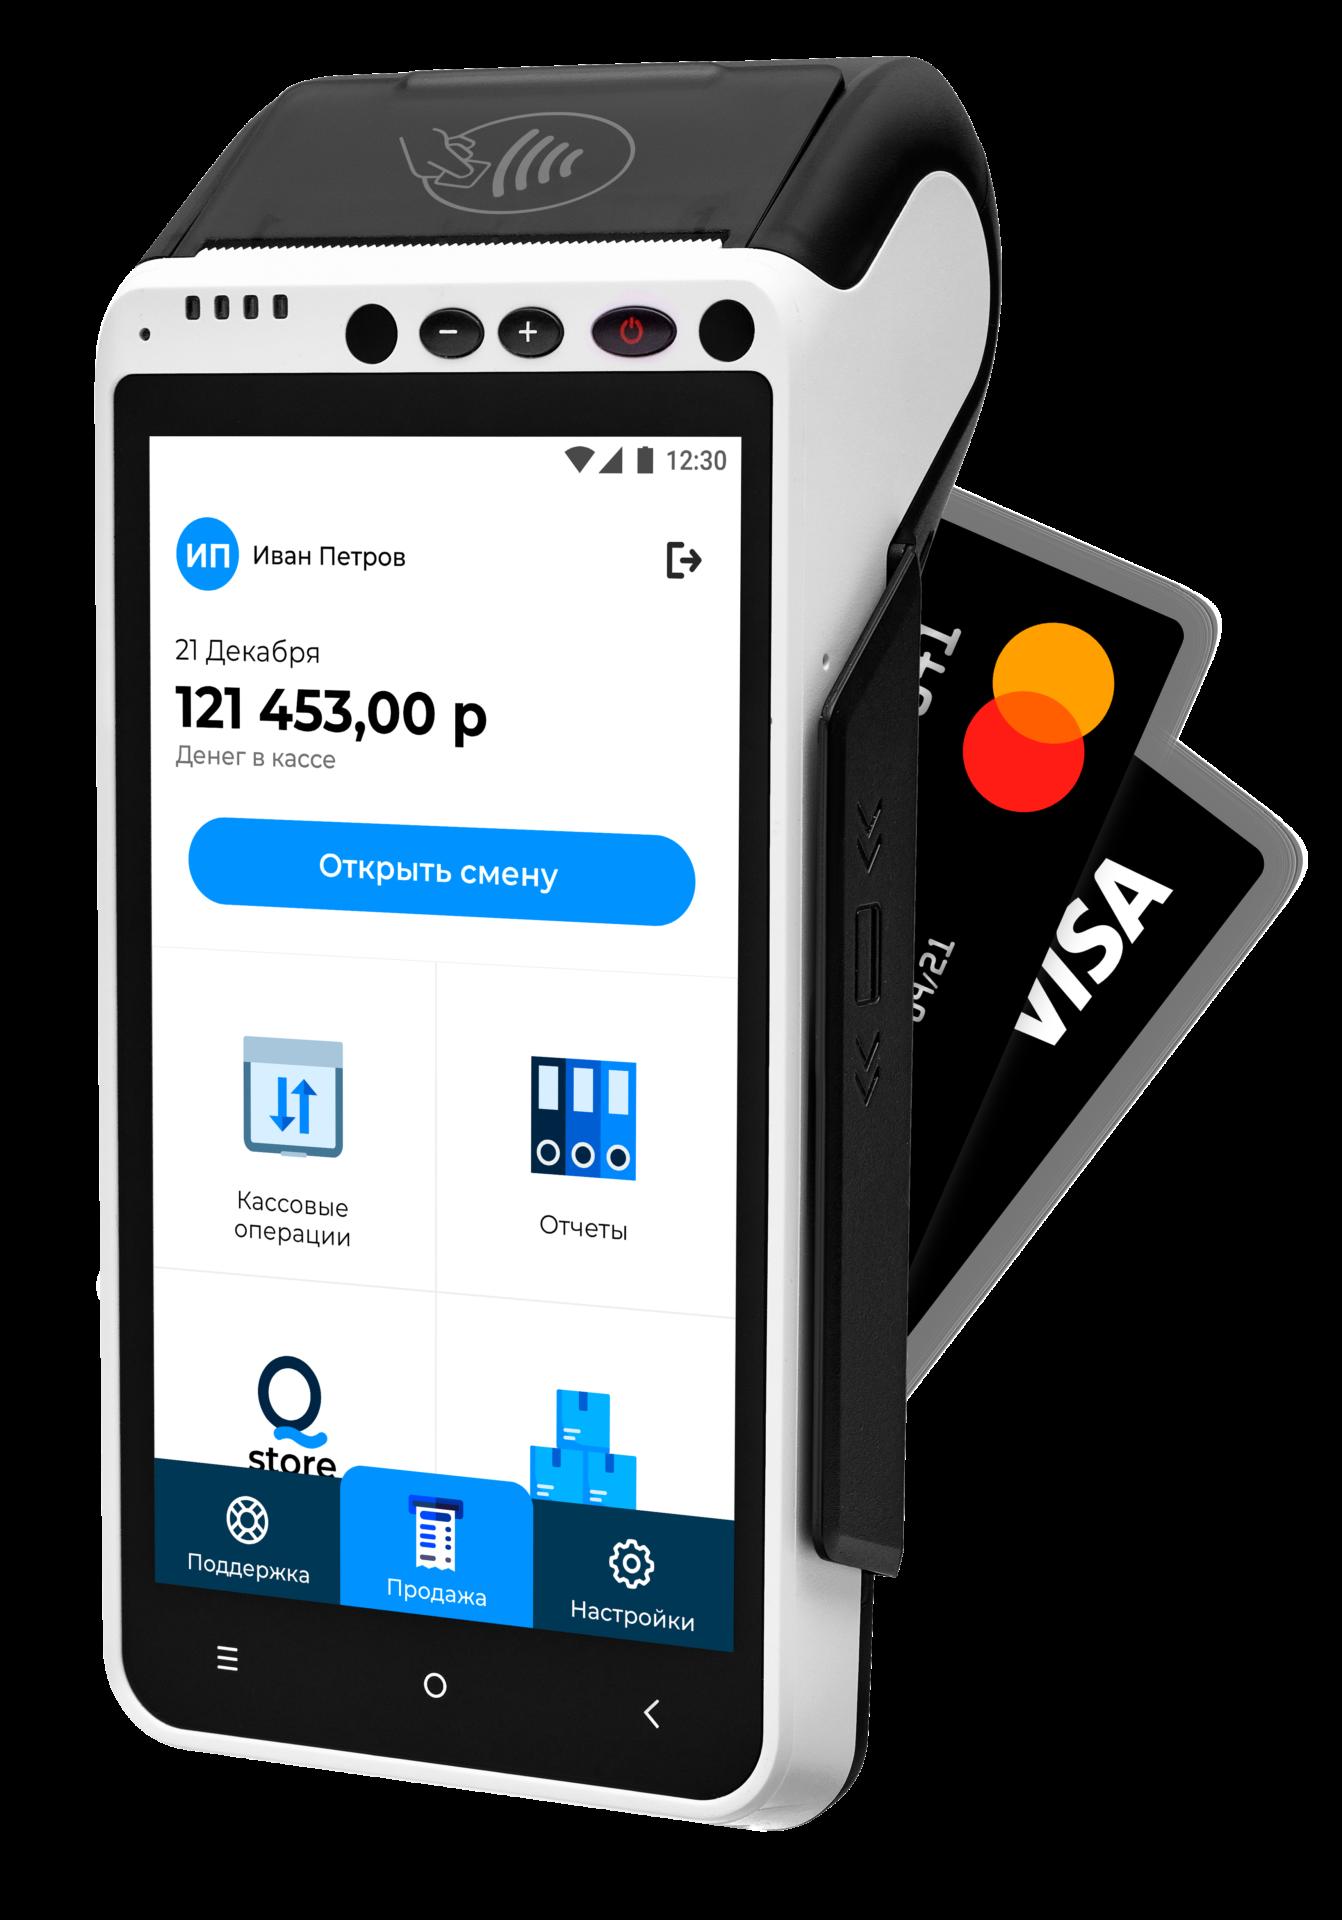 Онлайн-касса с банковским терминалом aQsi 5